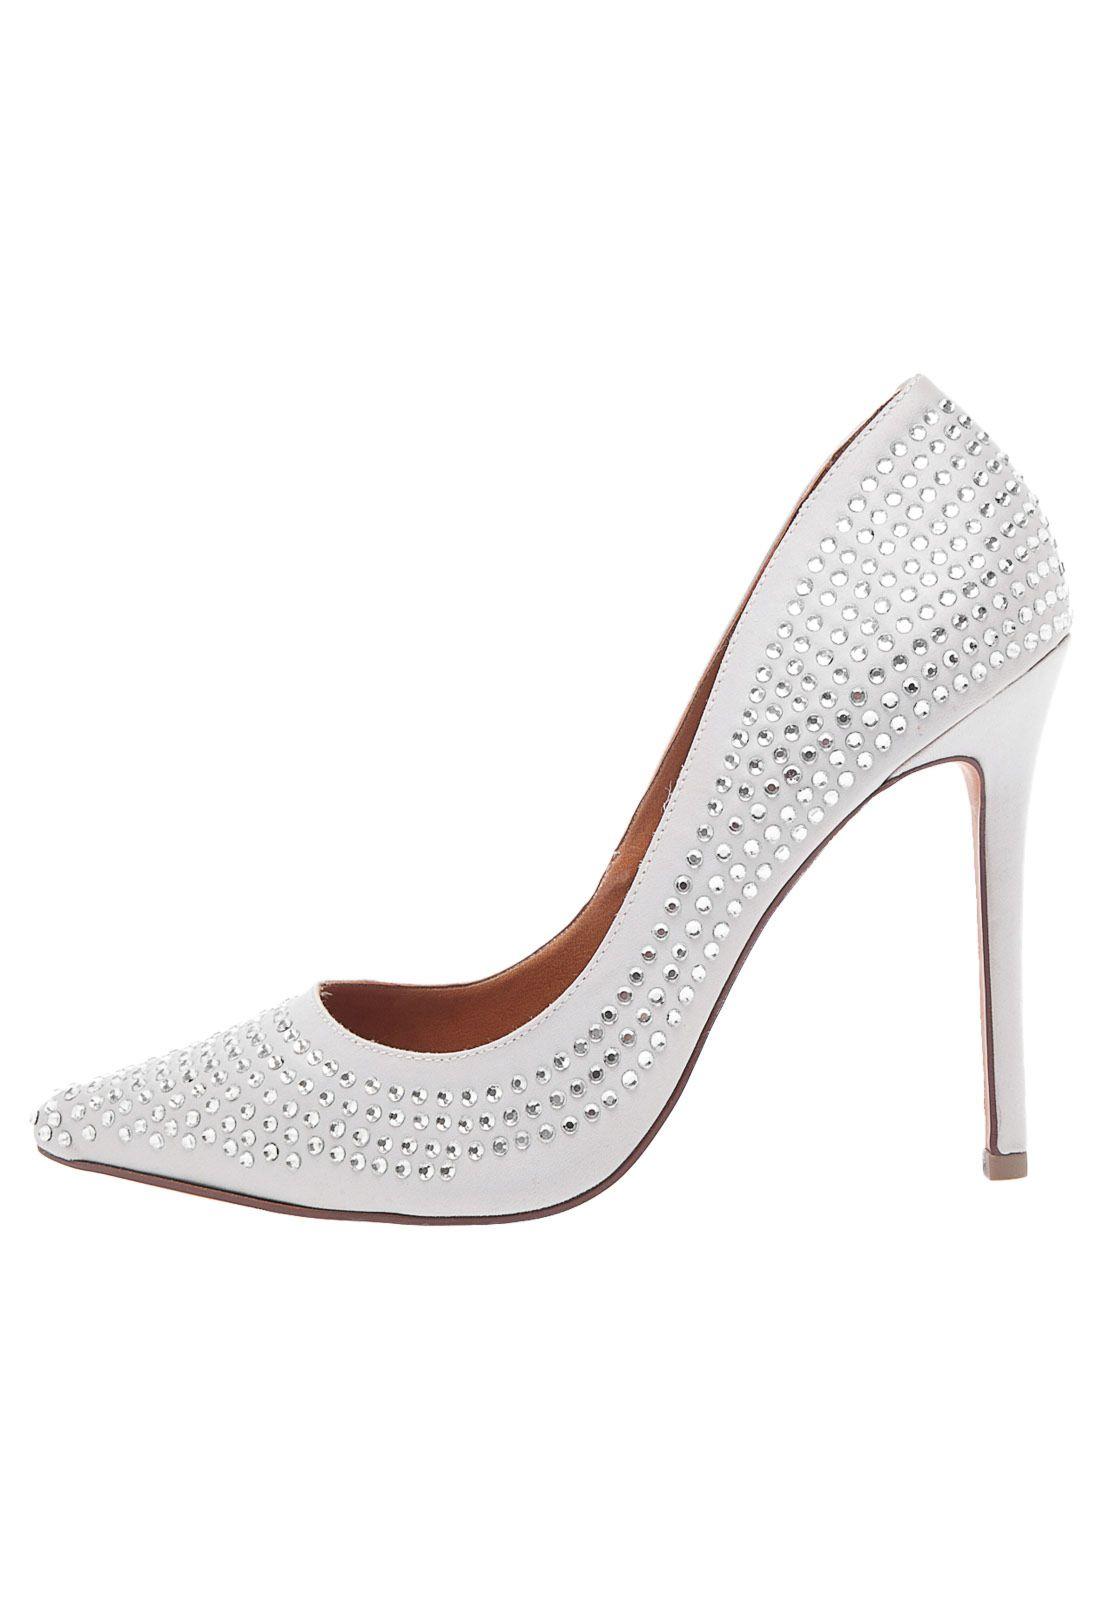 993187ca4 Scarpin Santa Lolla Strass Off | sapatos | Shoes, Off white e ...